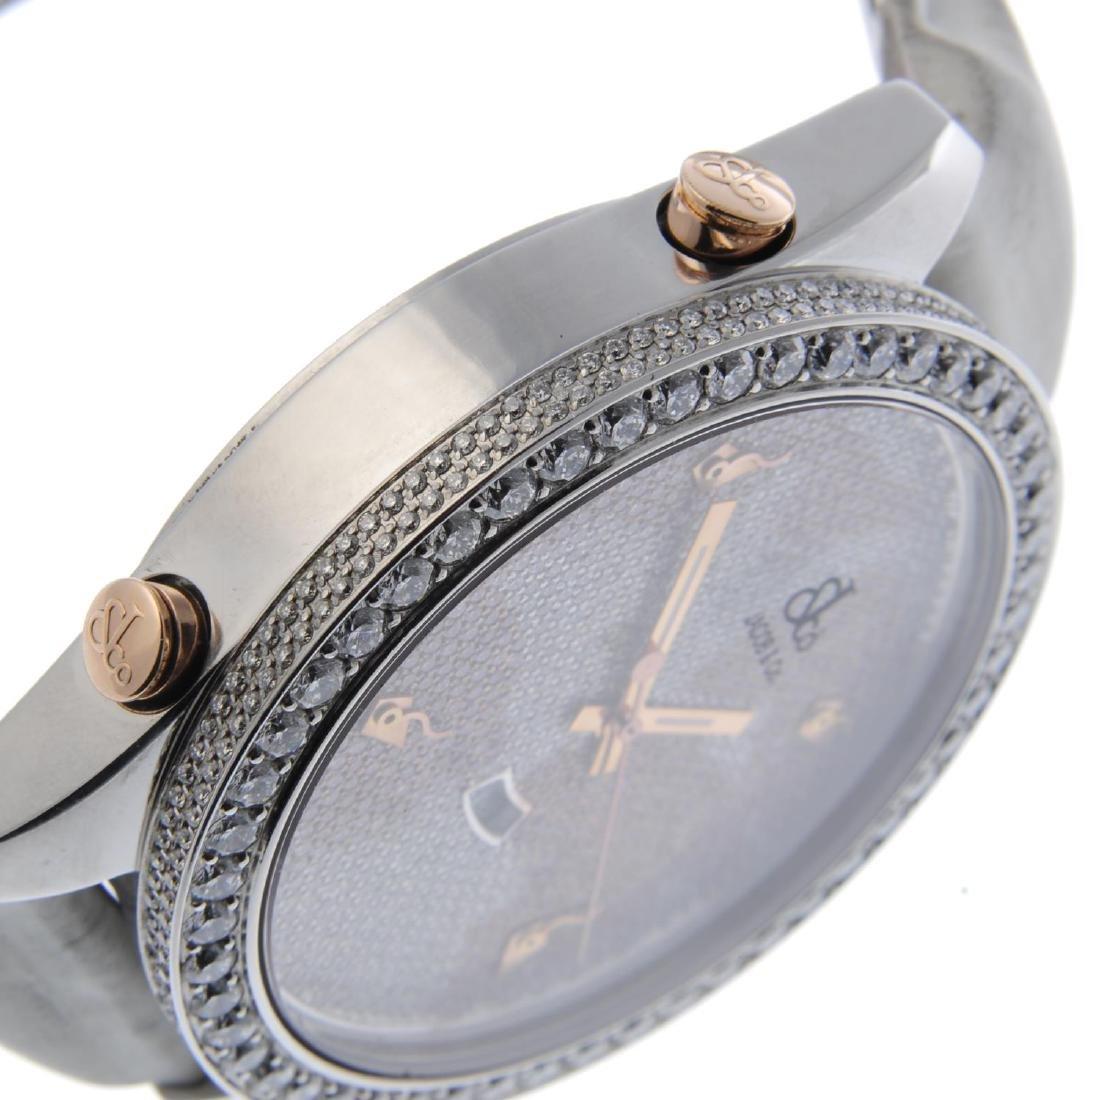 JACOB & CO - a lady's Five Time Zone wrist watch. - 5